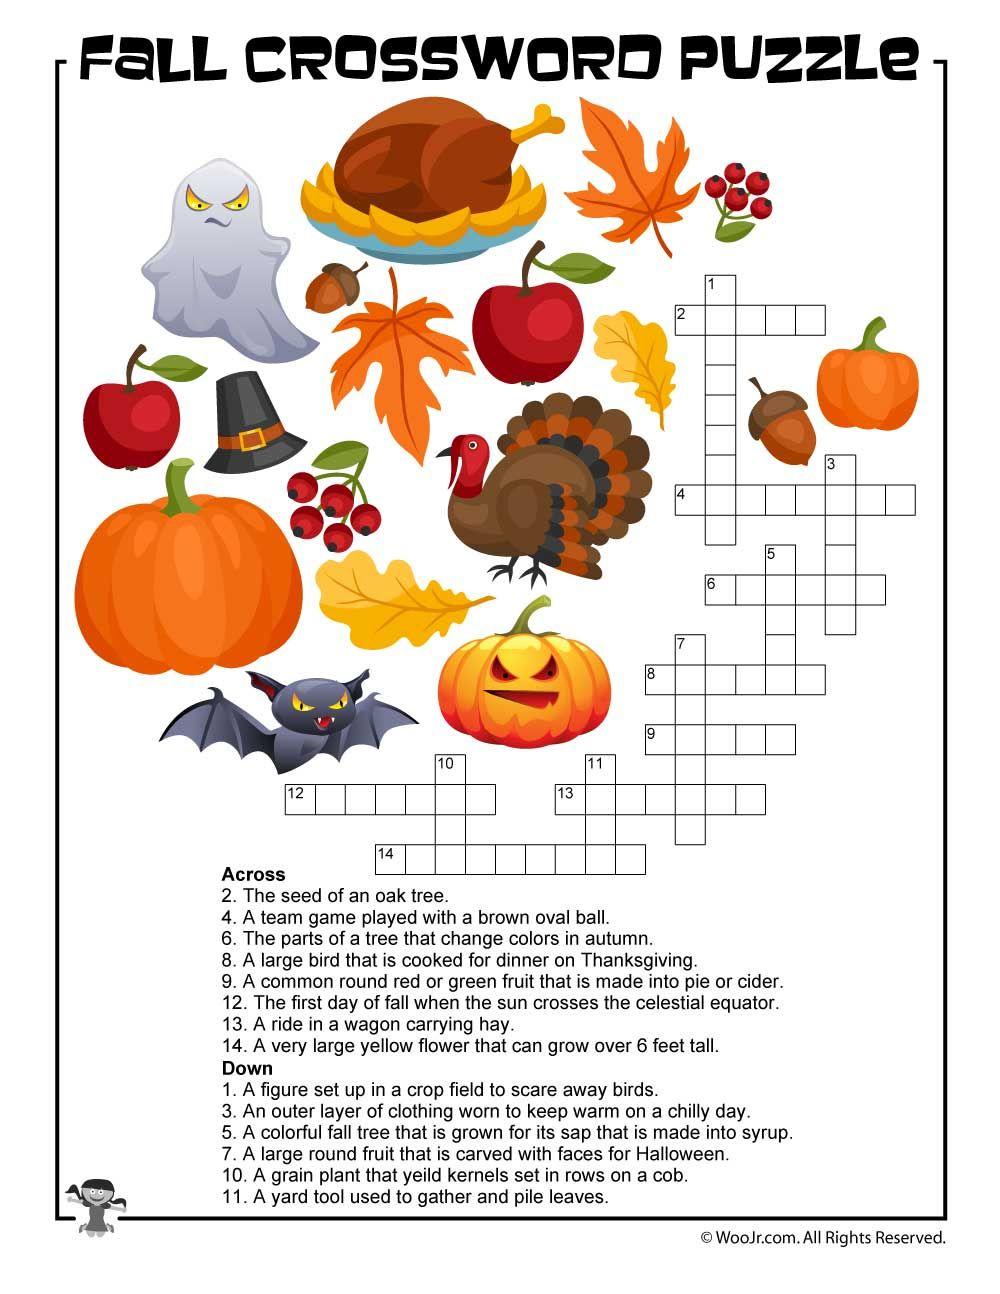 Fall Crossword Puzzle Printable | Halloween | Word Puzzles, Puzzles - Fall Crossword Puzzle Printable